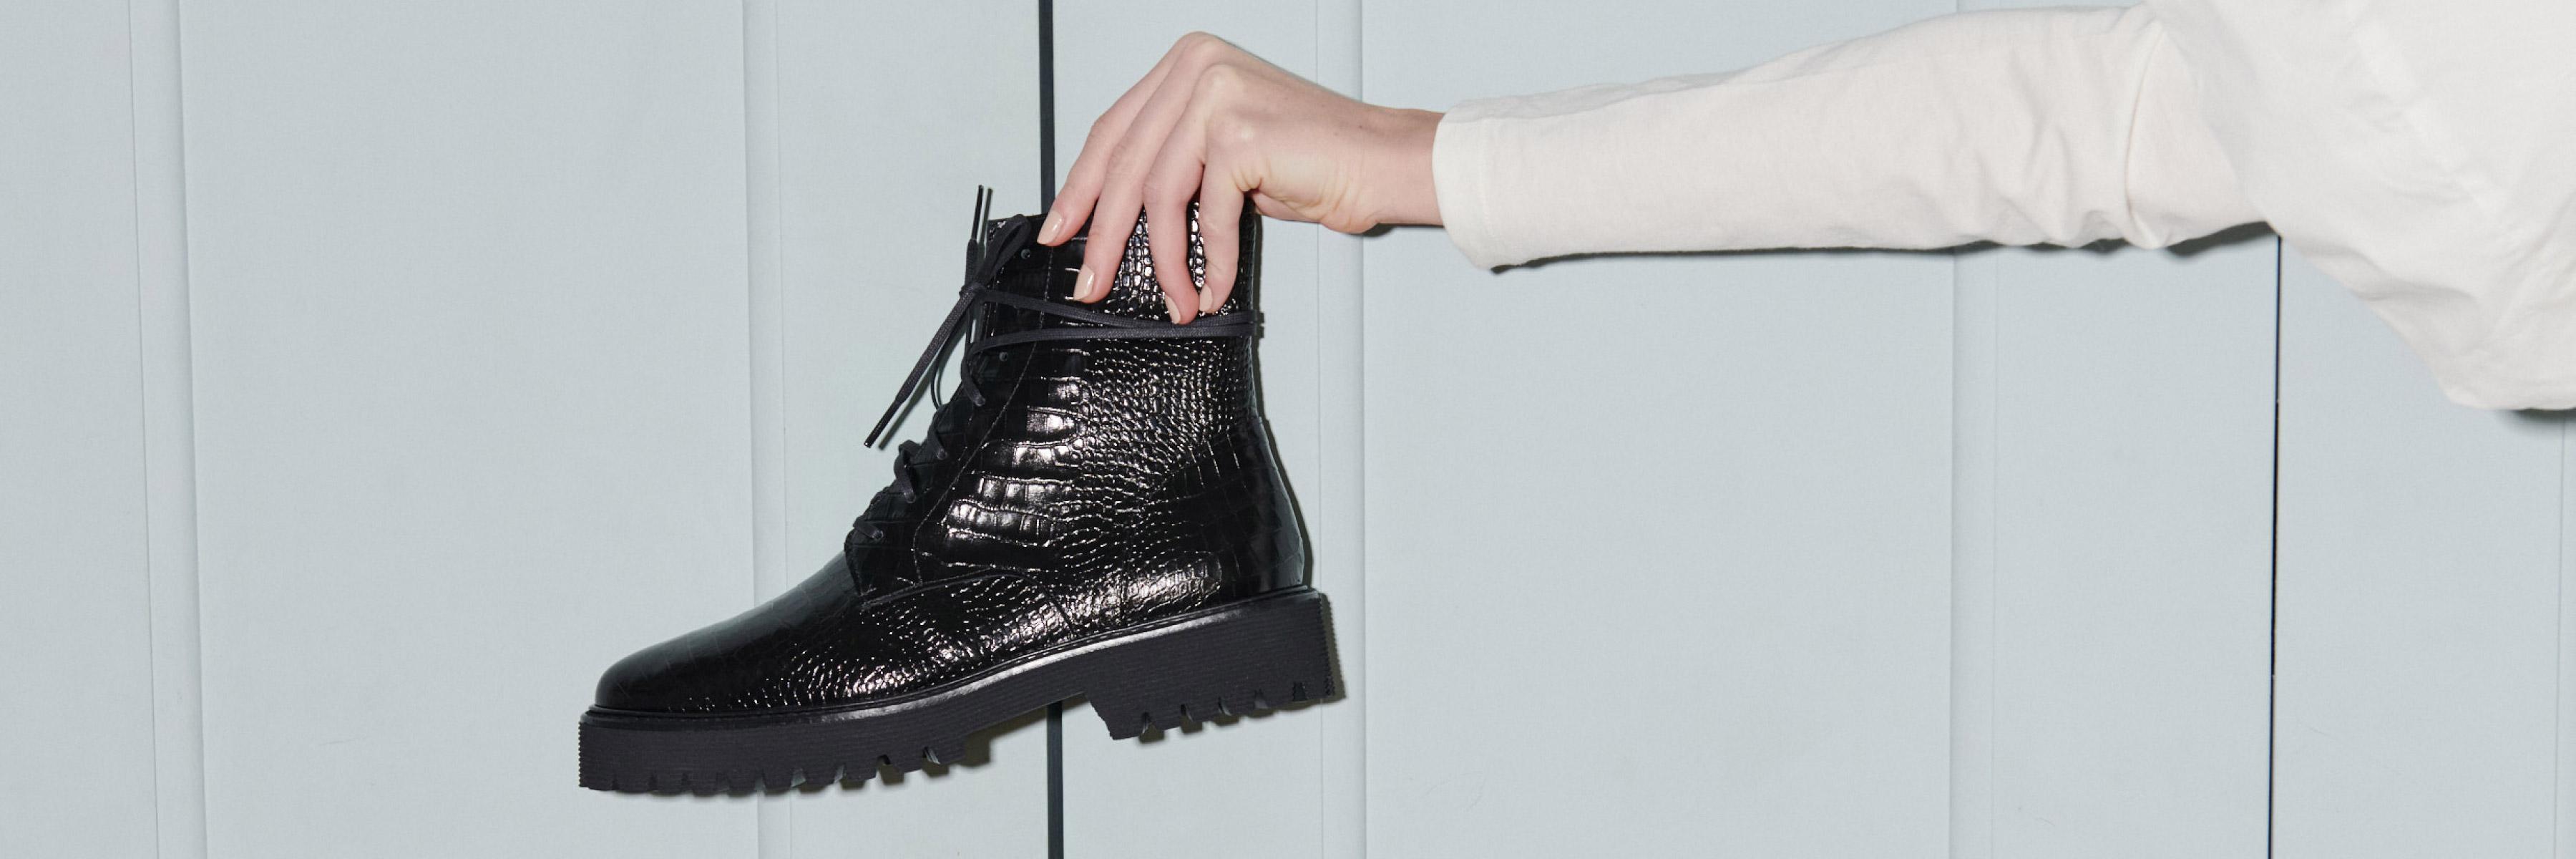 Seasonless Boots